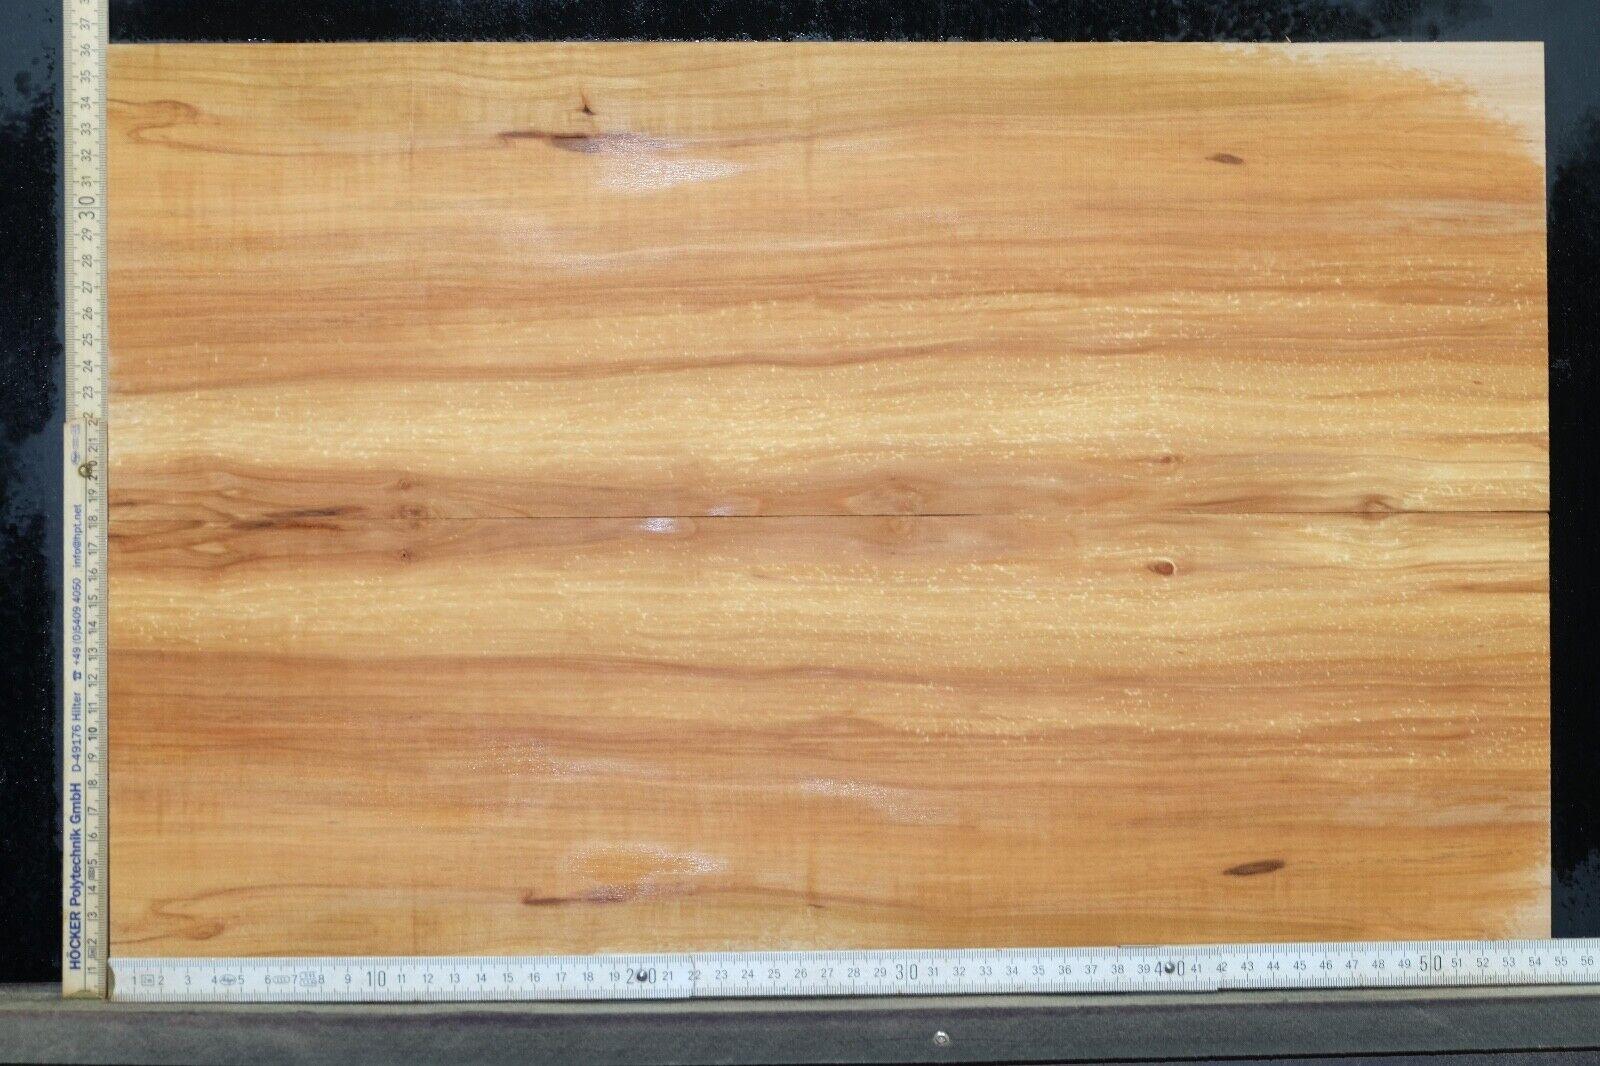 Tonewood Apple 9,8 mm Cap Strips Figured Topset Guitar Luthier Droptop 24